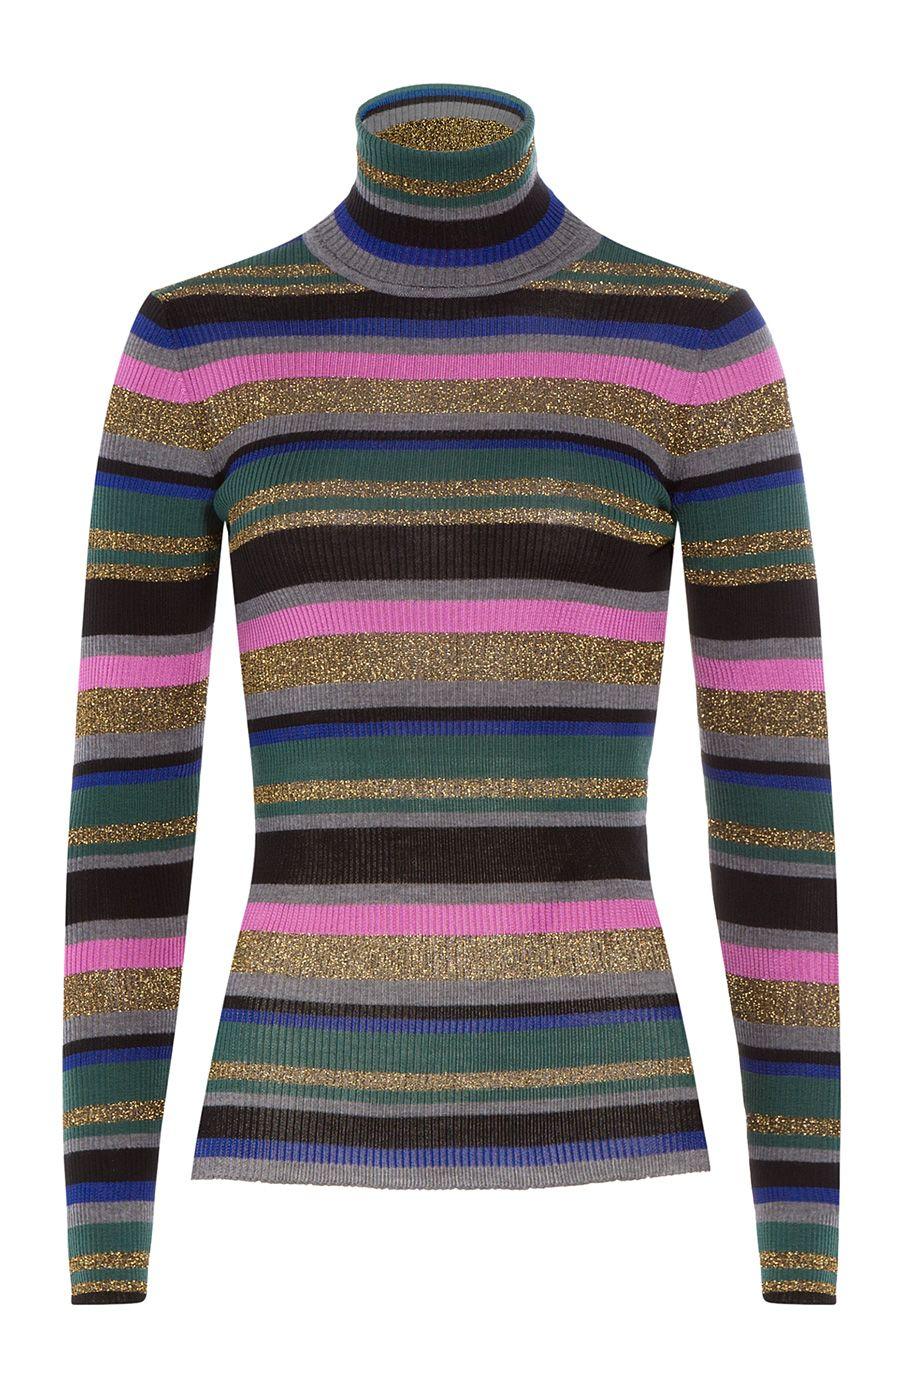 6c8728ccd378 EMILIO PUCCI Striped Wool Turtleneck Pullover